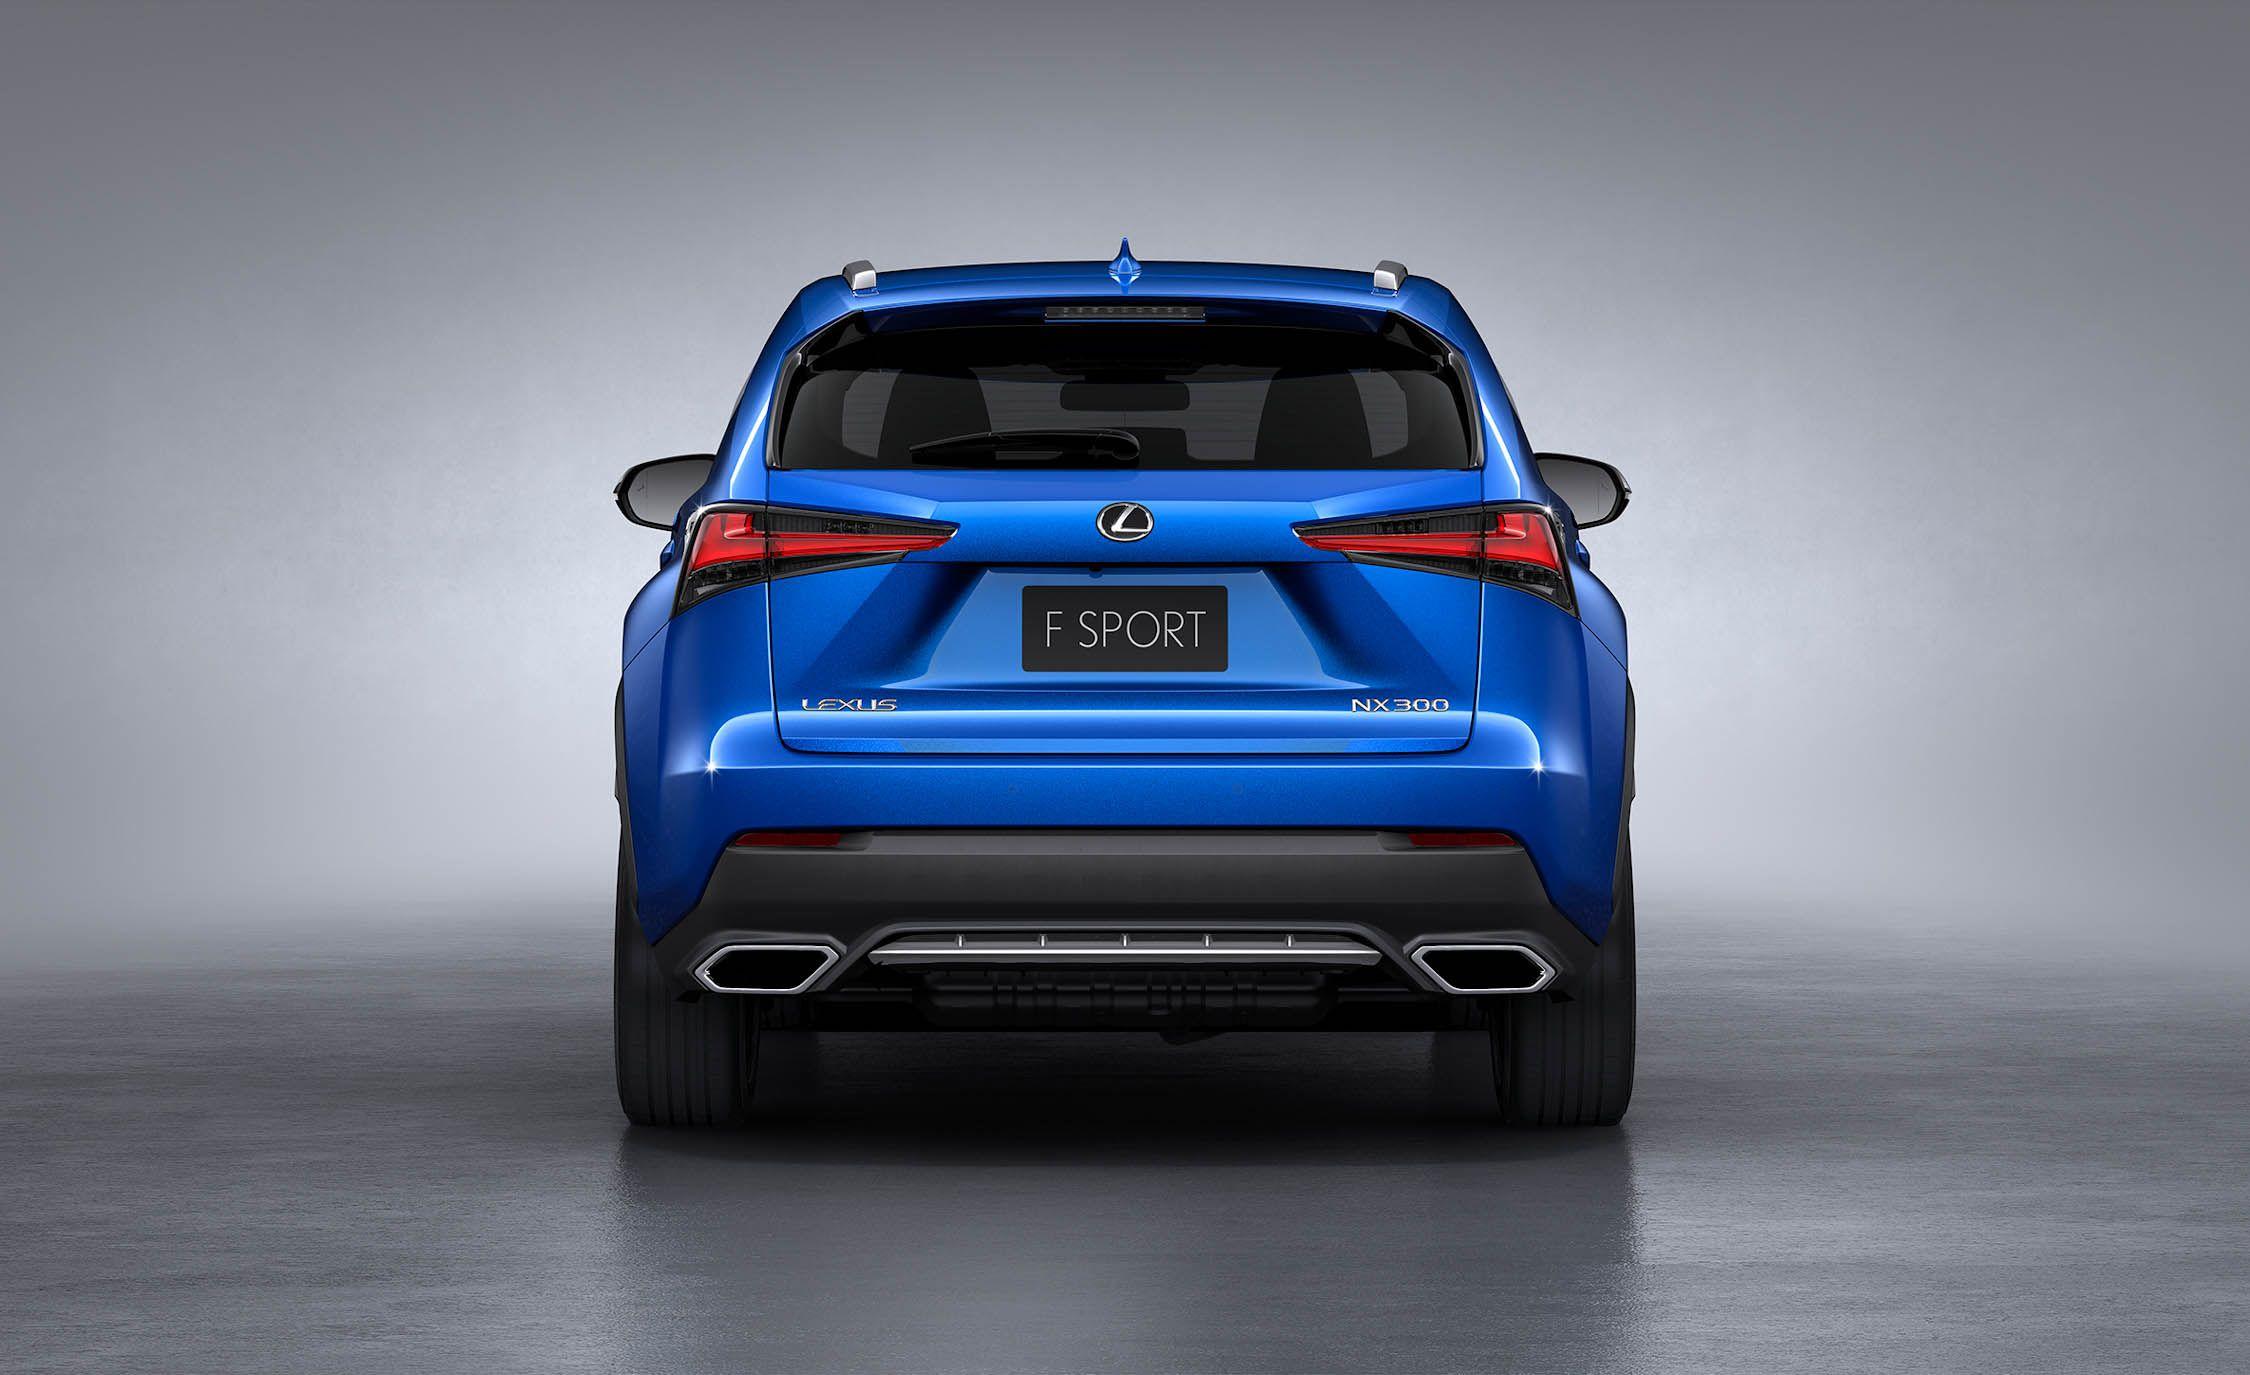 2019 Lexus Nx Reviews Lexus Nx Price Photos And Specs Car And